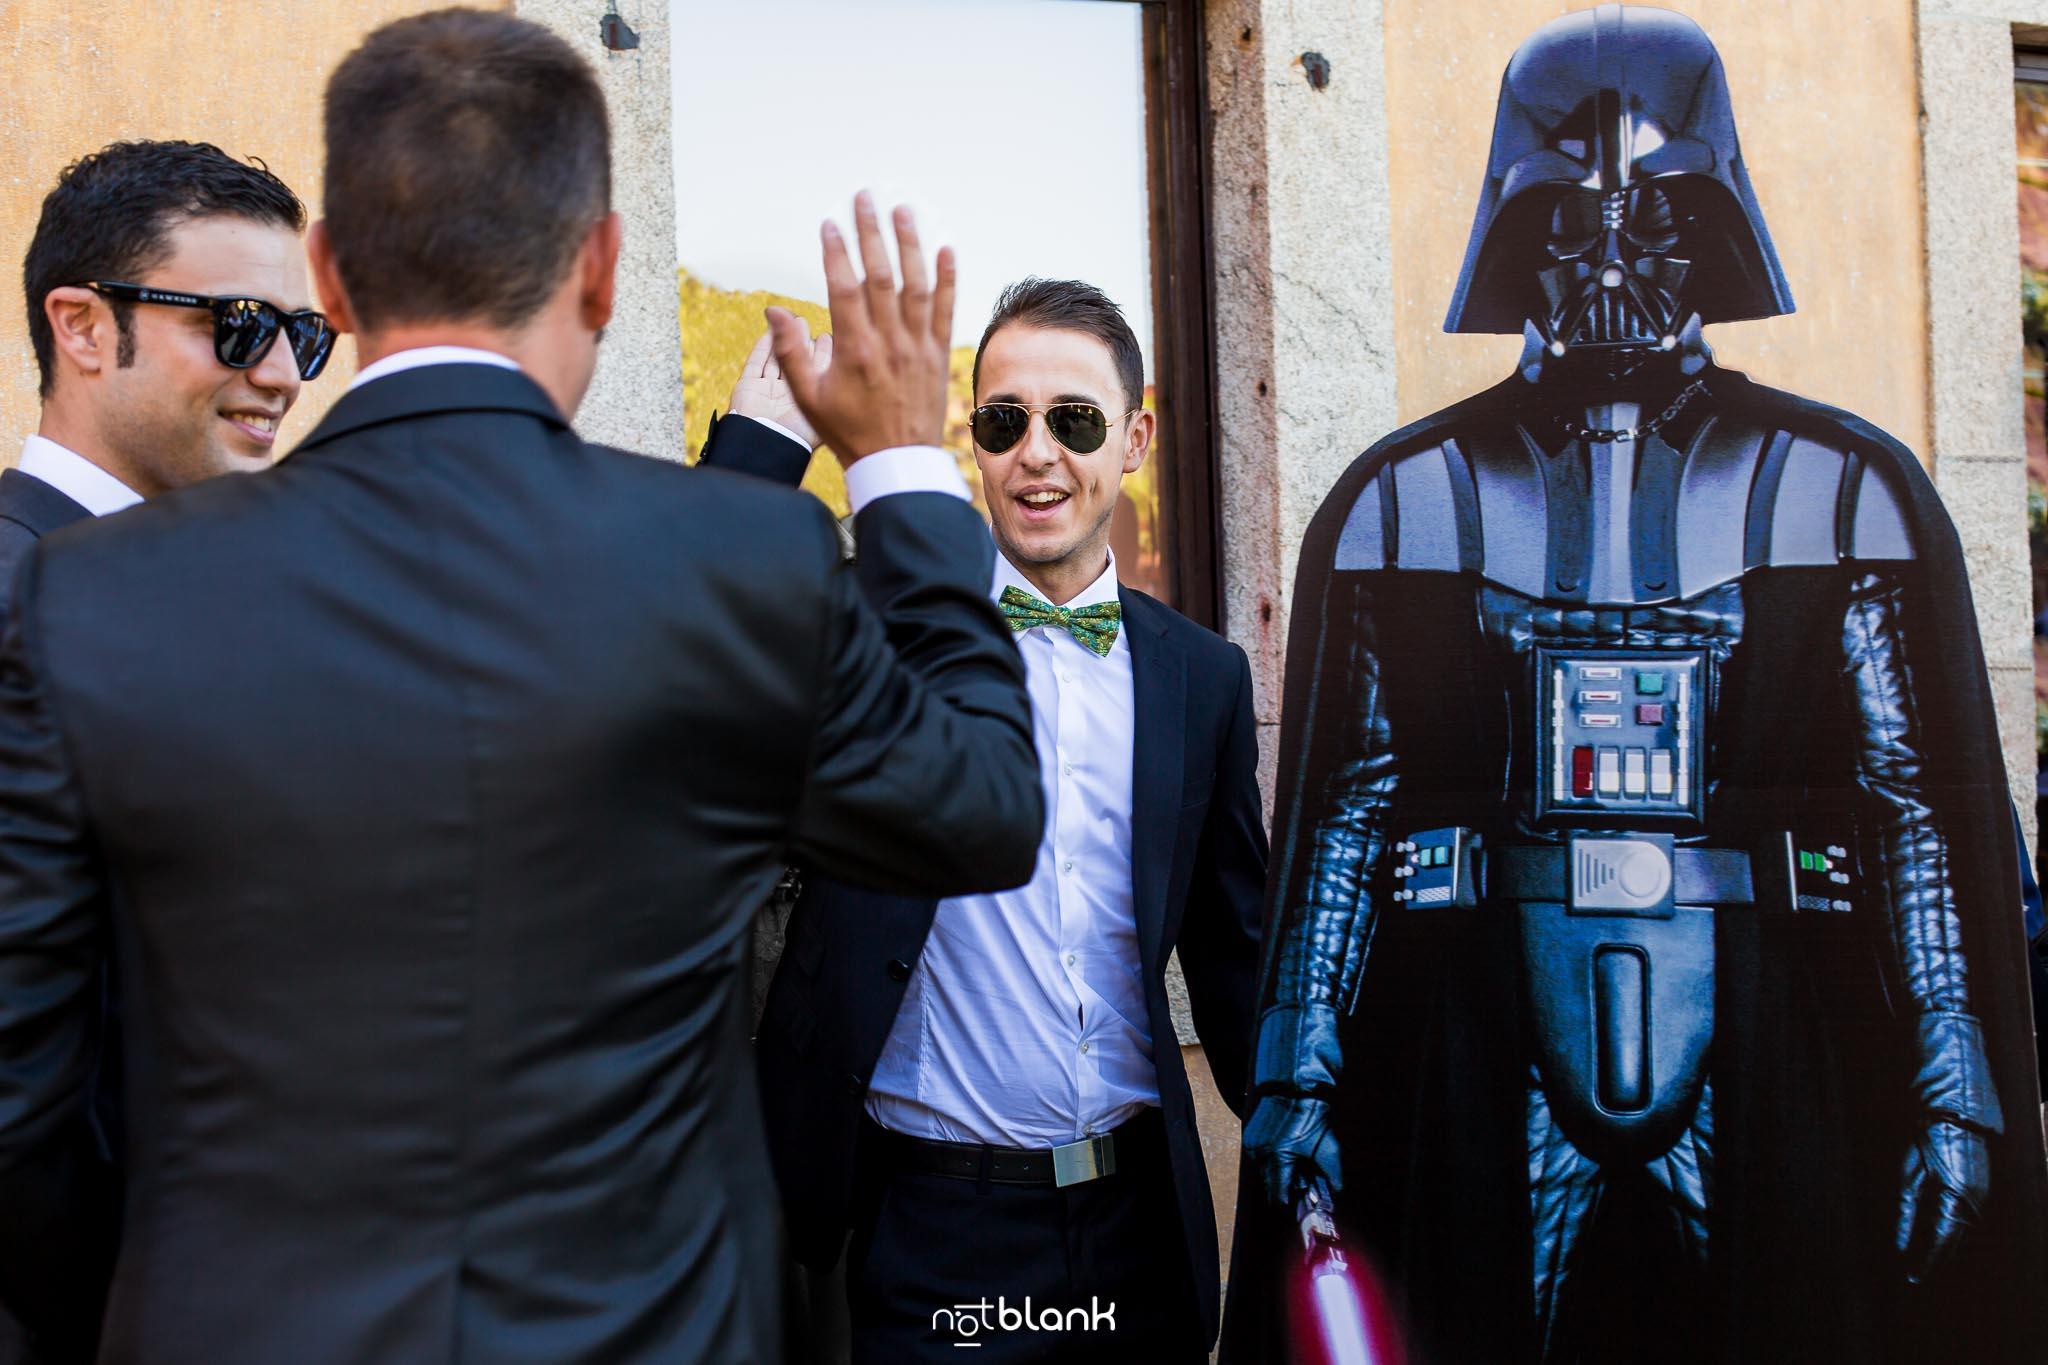 notblank-boda-Fotógrafo de boda-Malaposta-Portugal-Darth Vader-Star Wars-Boda Temática